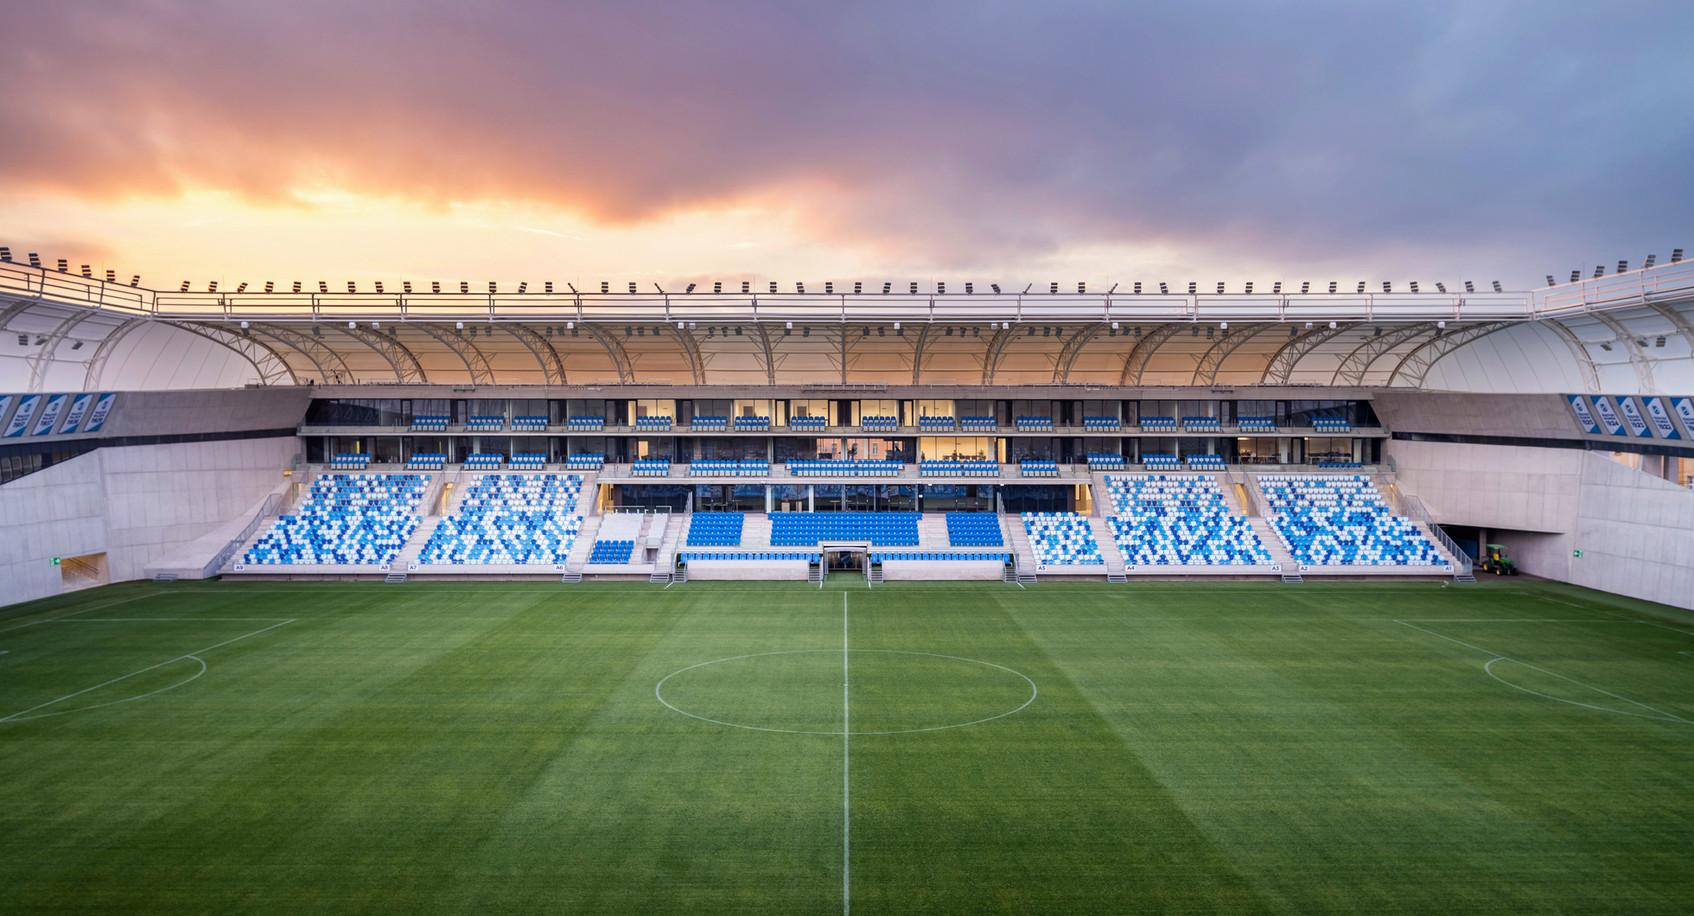 MTK_Stadion_PGY-255.jpg